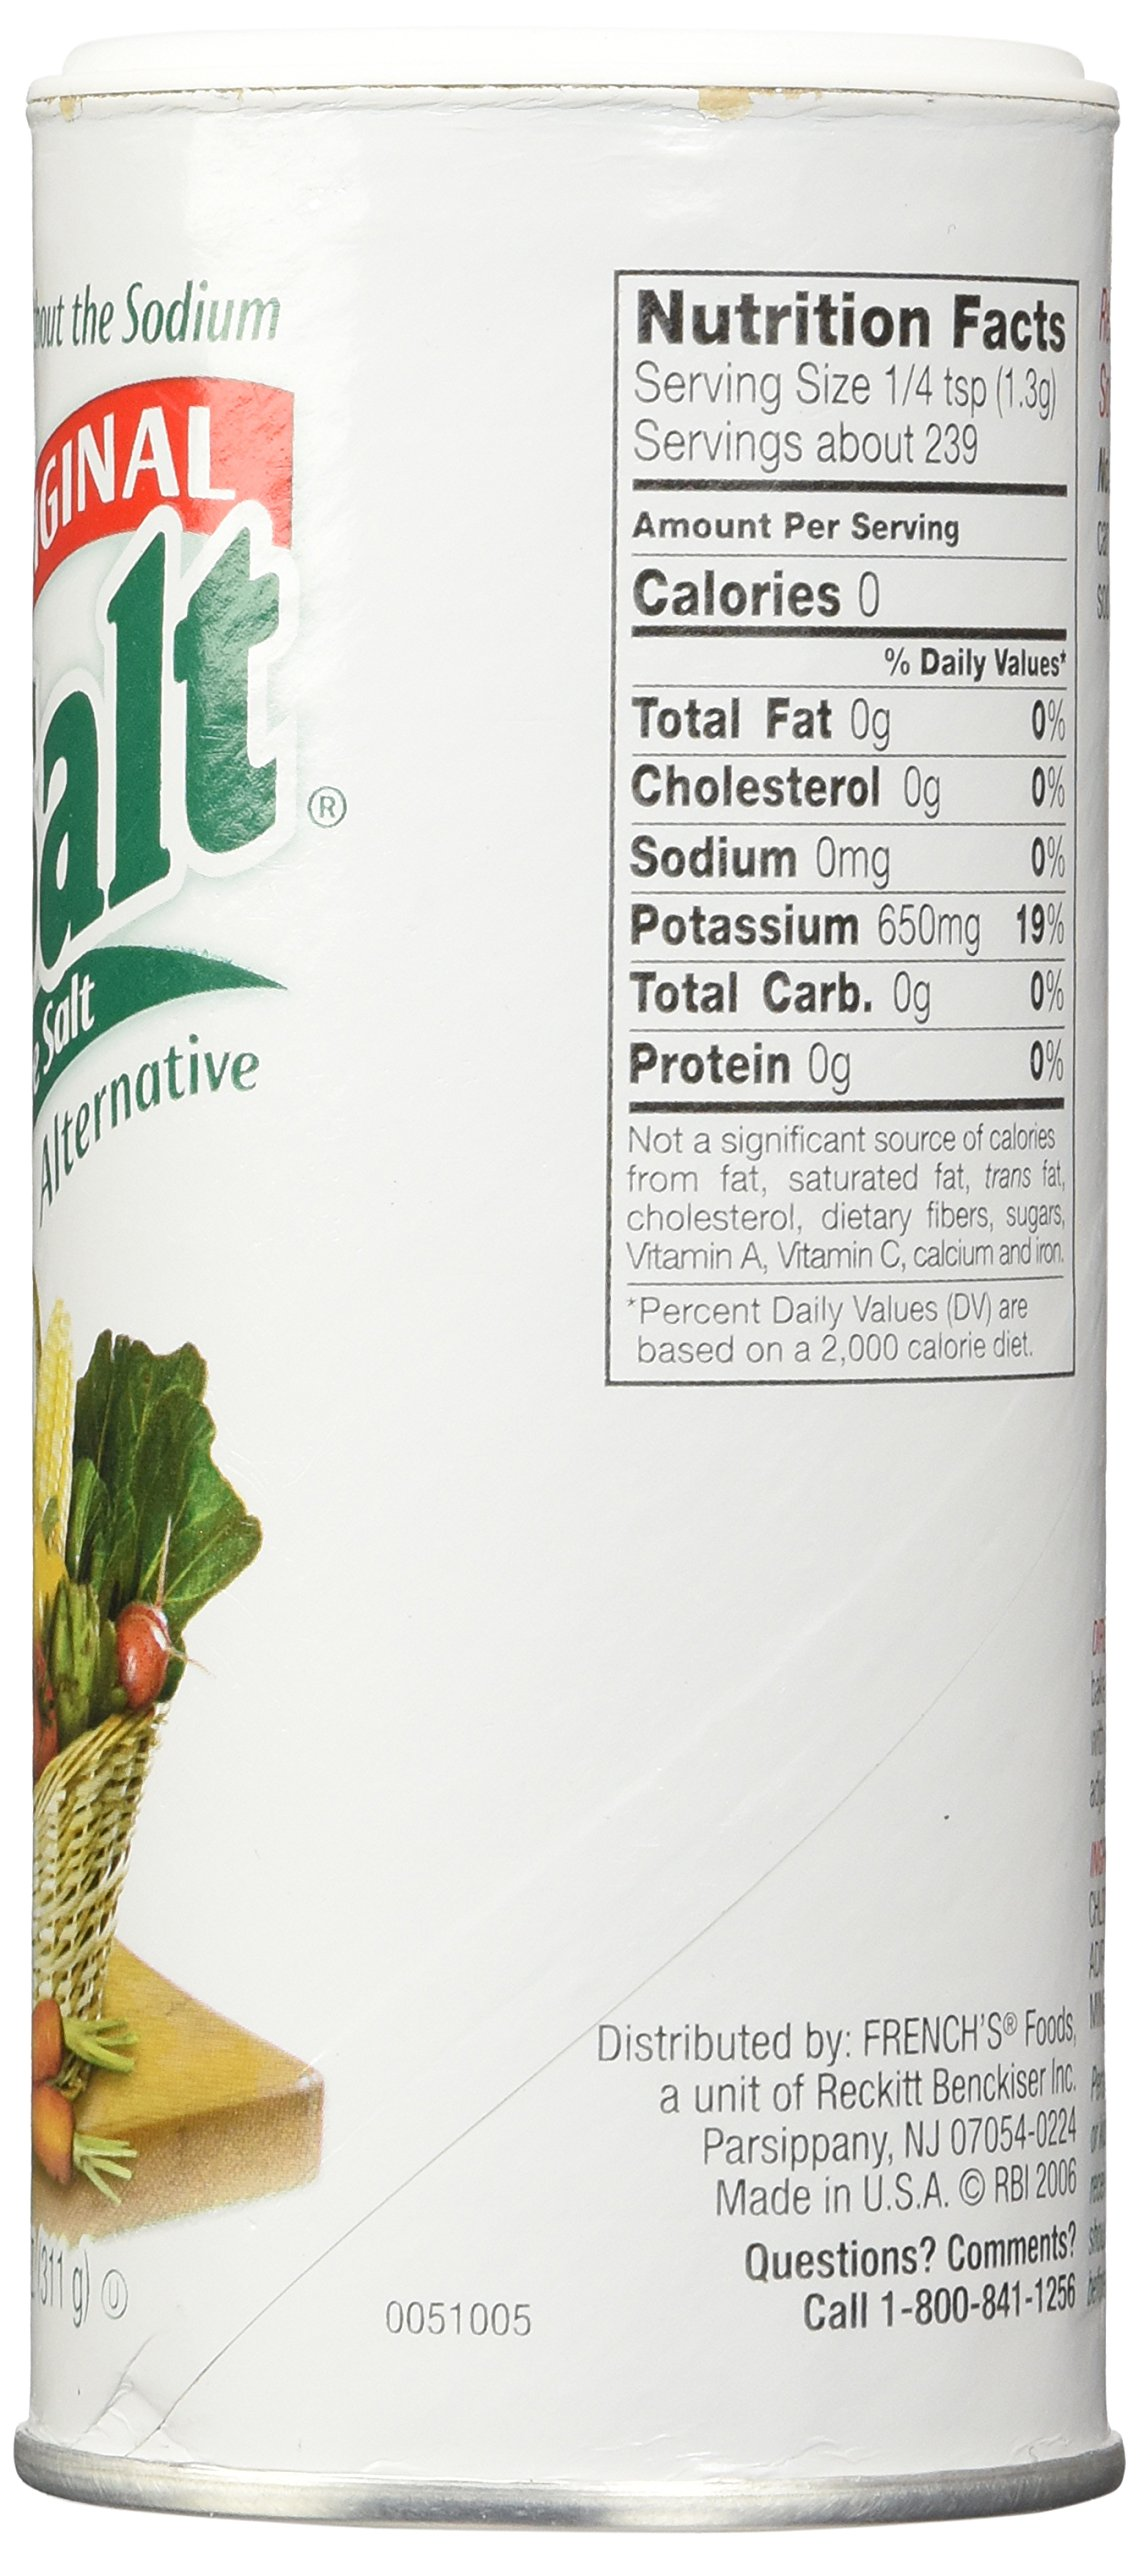 NoSalt Original Sodium-Free Salt Alternative 11 Ounce (Pack of 2) by Nosalt (Image #4)